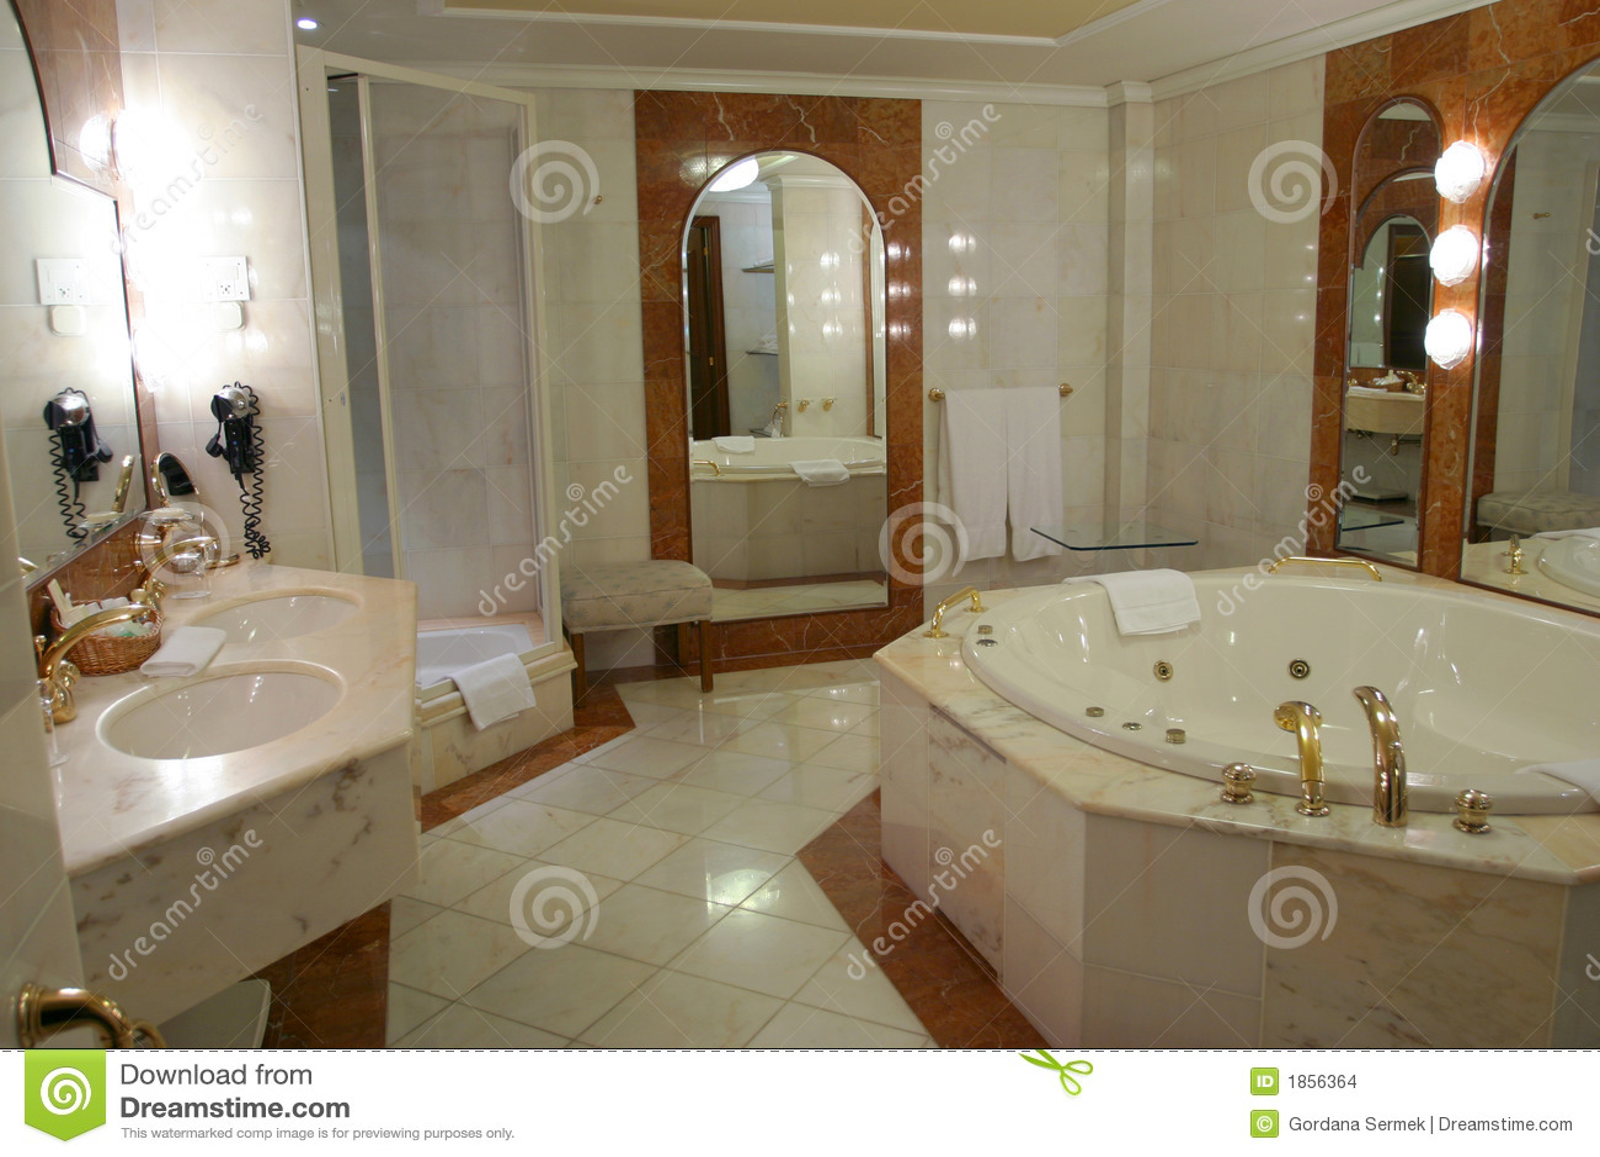 Moderne en ruime badkamers stock foto afbeelding bestaande uit ontwerp 1856364 - Gemeubleerde salle de bains ontwerp ...